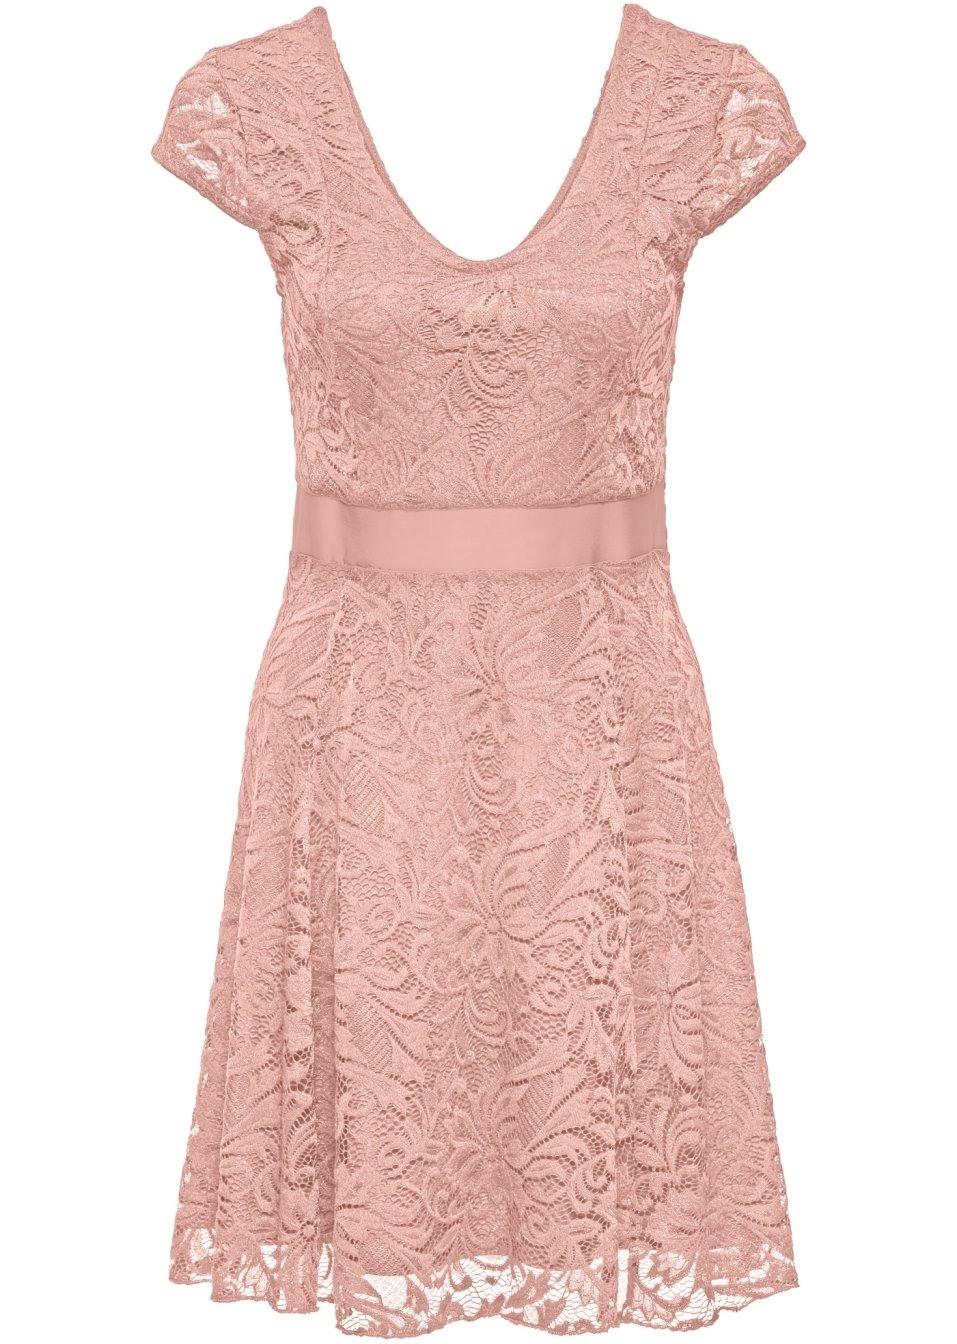 15 Luxus Lachsfarbenes Kleid Stylish20 Elegant Lachsfarbenes Kleid Ärmel